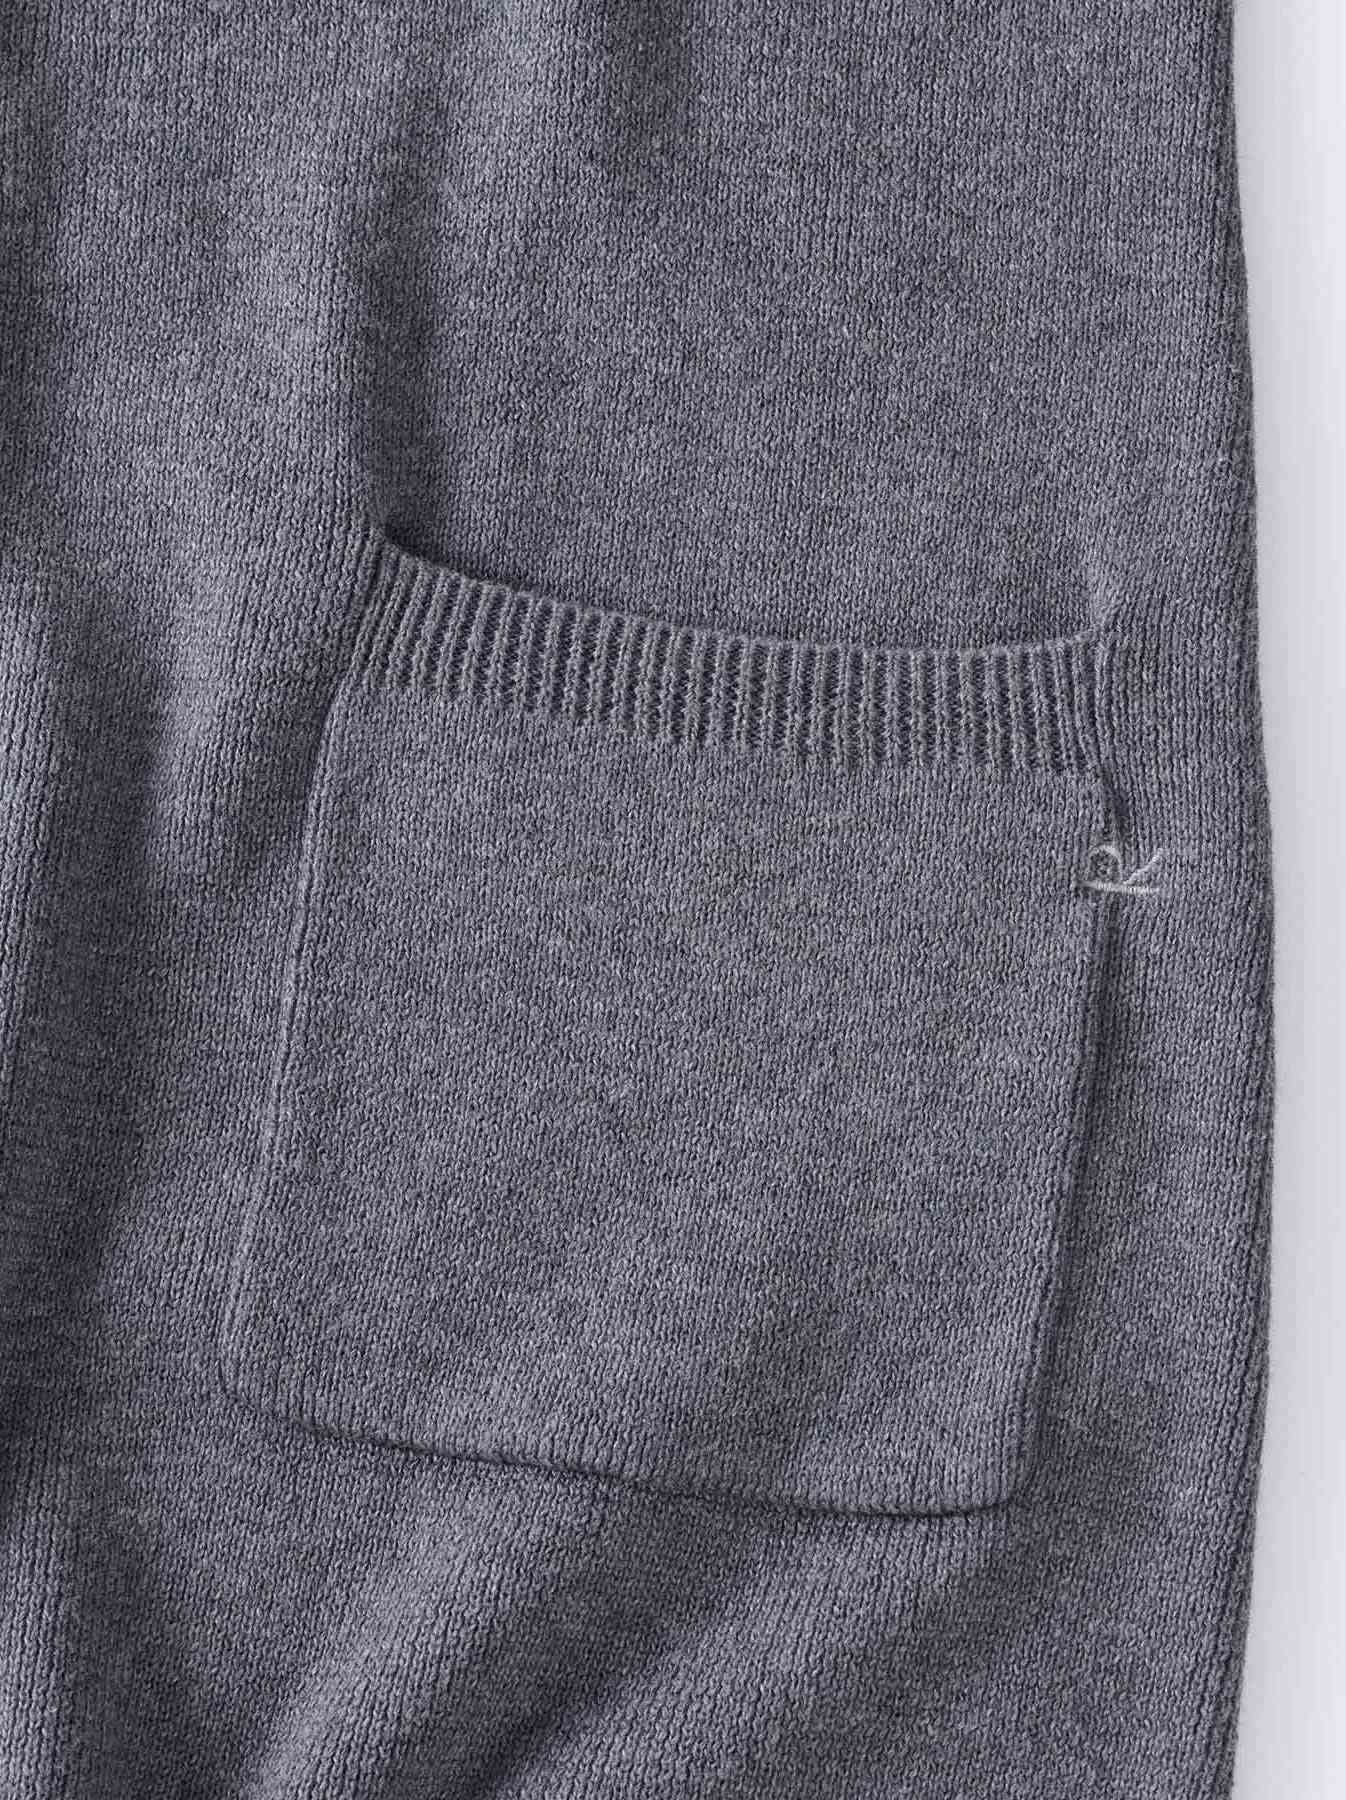 WH Supima Knit-sew Coat-10